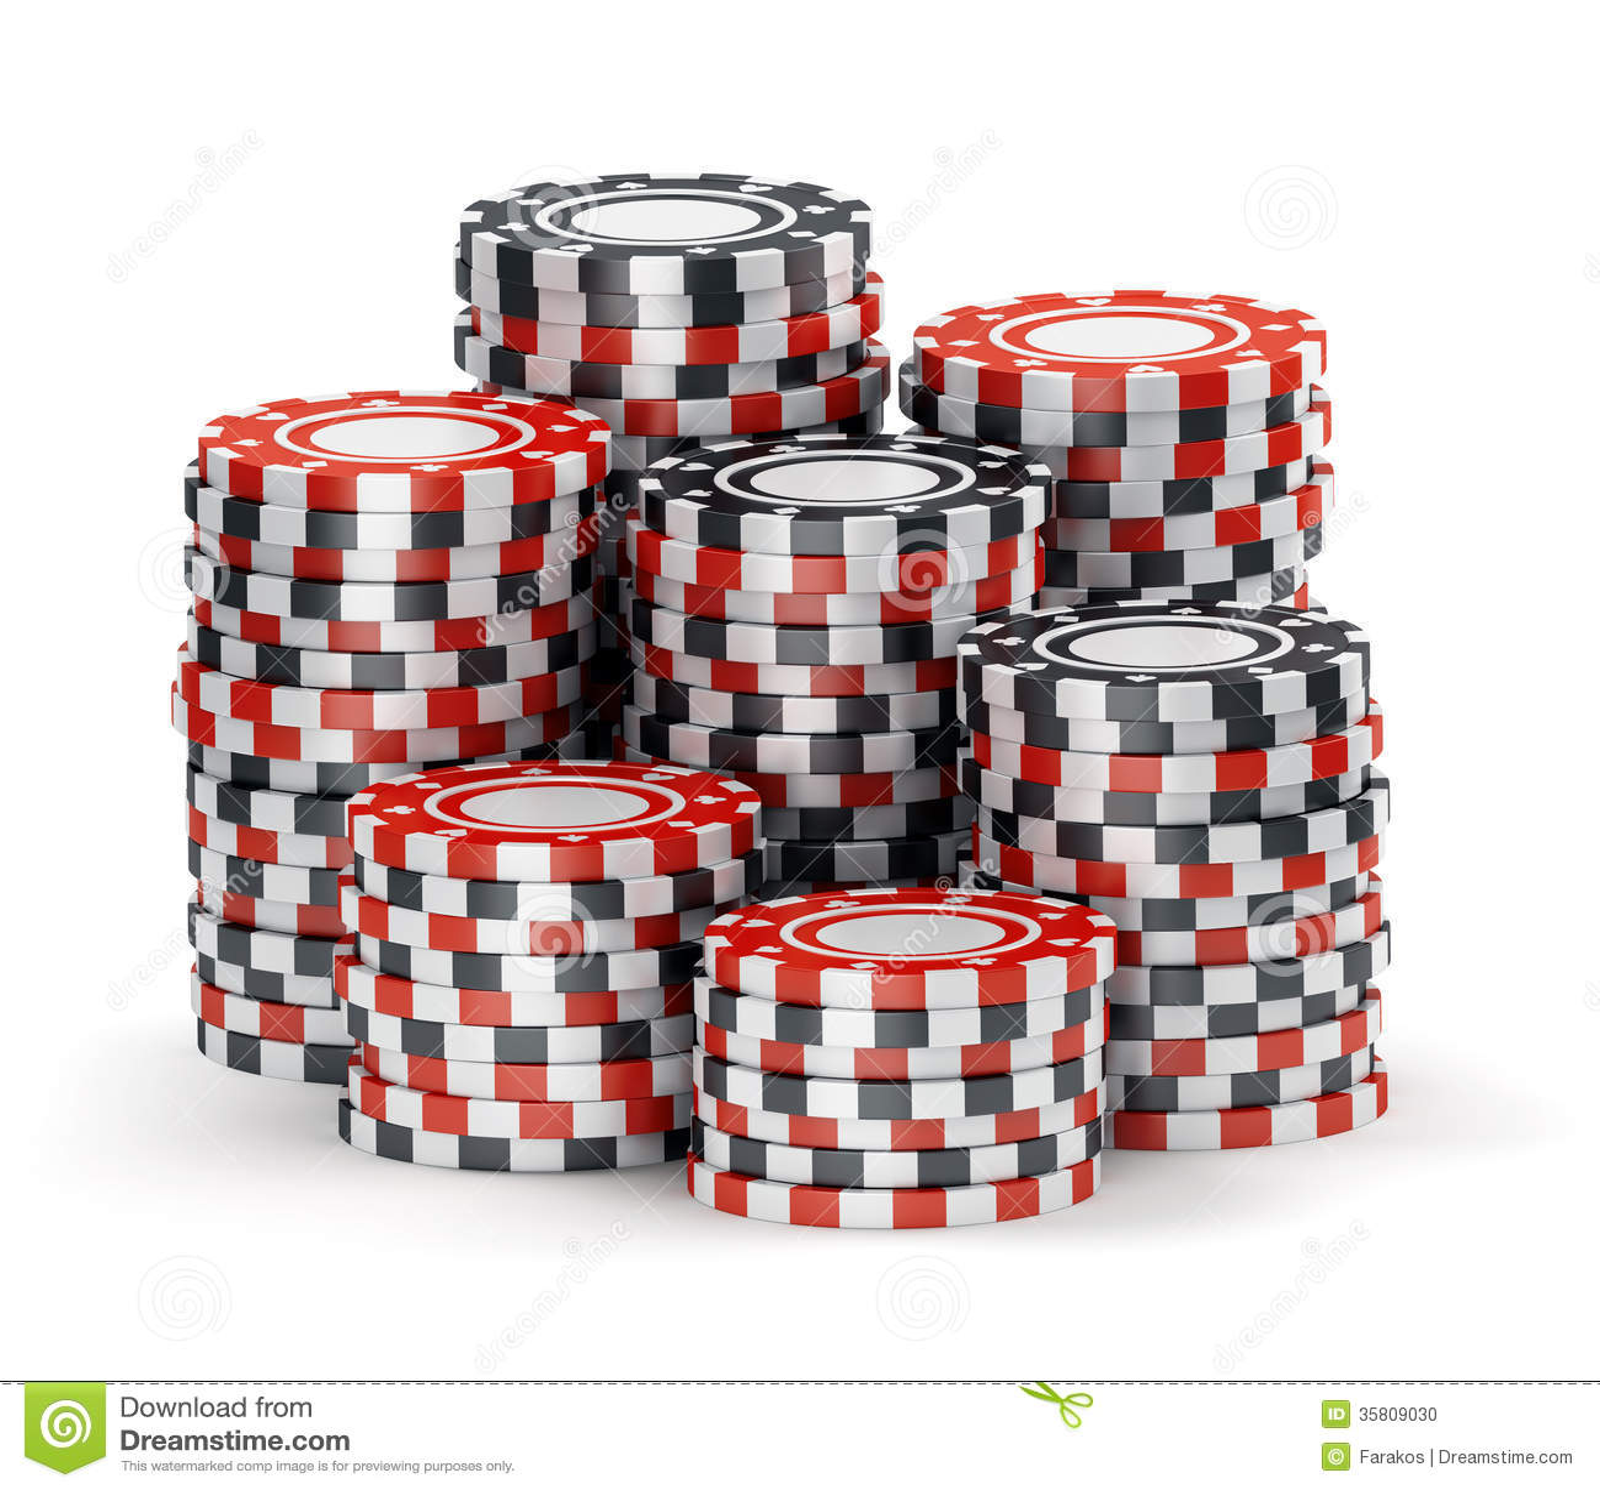 online gambling room